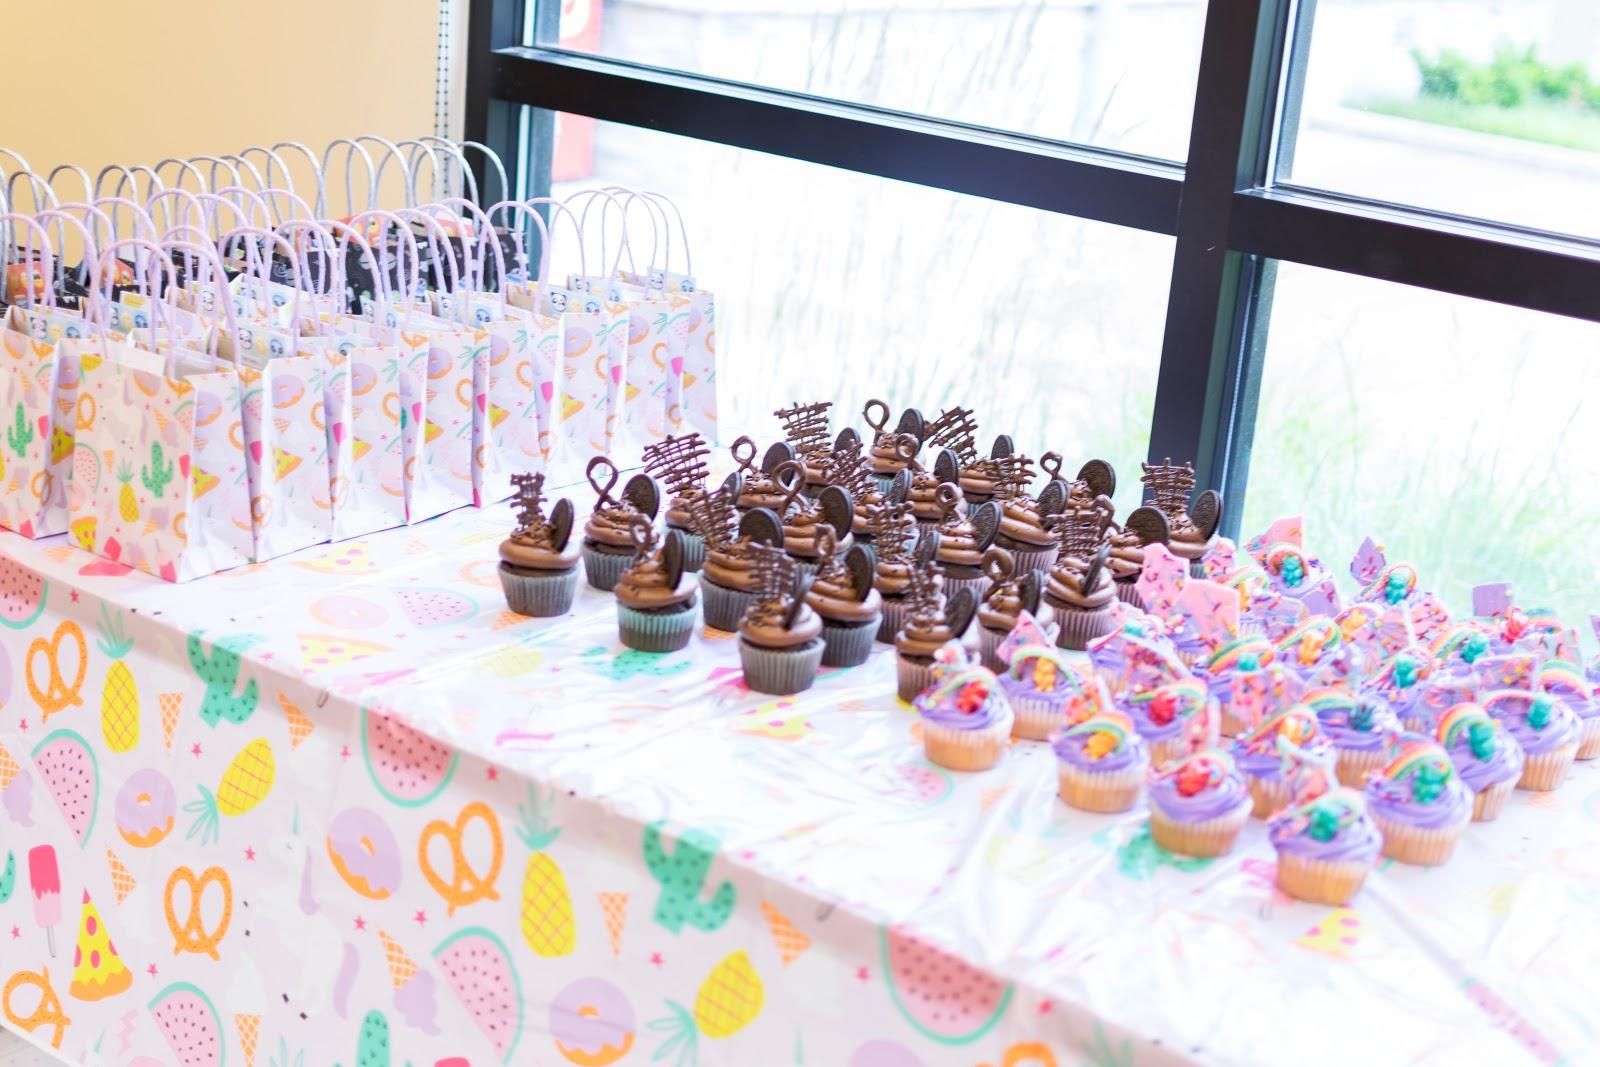 Daphnie Pearl 8 Birthday Party Supplies Decorations Fun Unicorn Target Donut Pineapple Ice Cream Chocolate